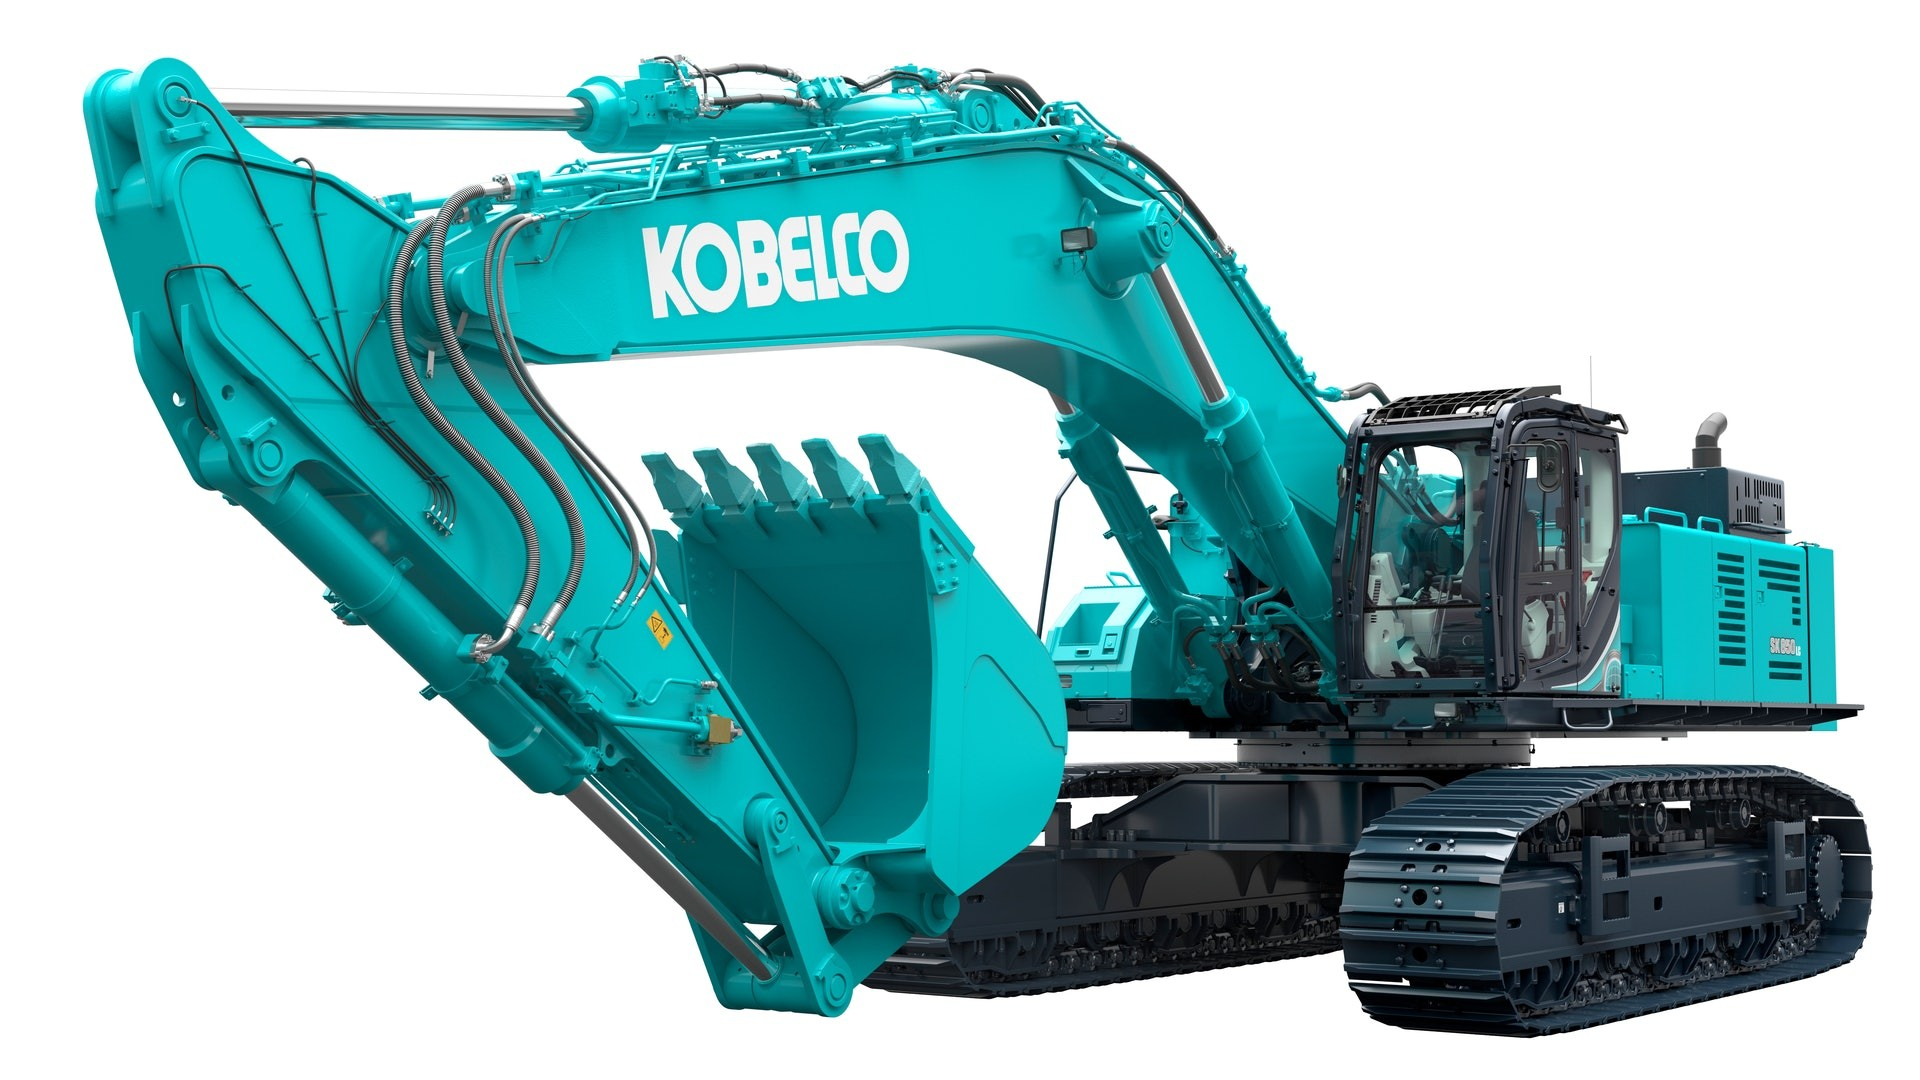 Kobelco torq Convertor Kobelco Europe Debuting Its St Excavator at Bauma 2019 Of Kobelco torq Convertor